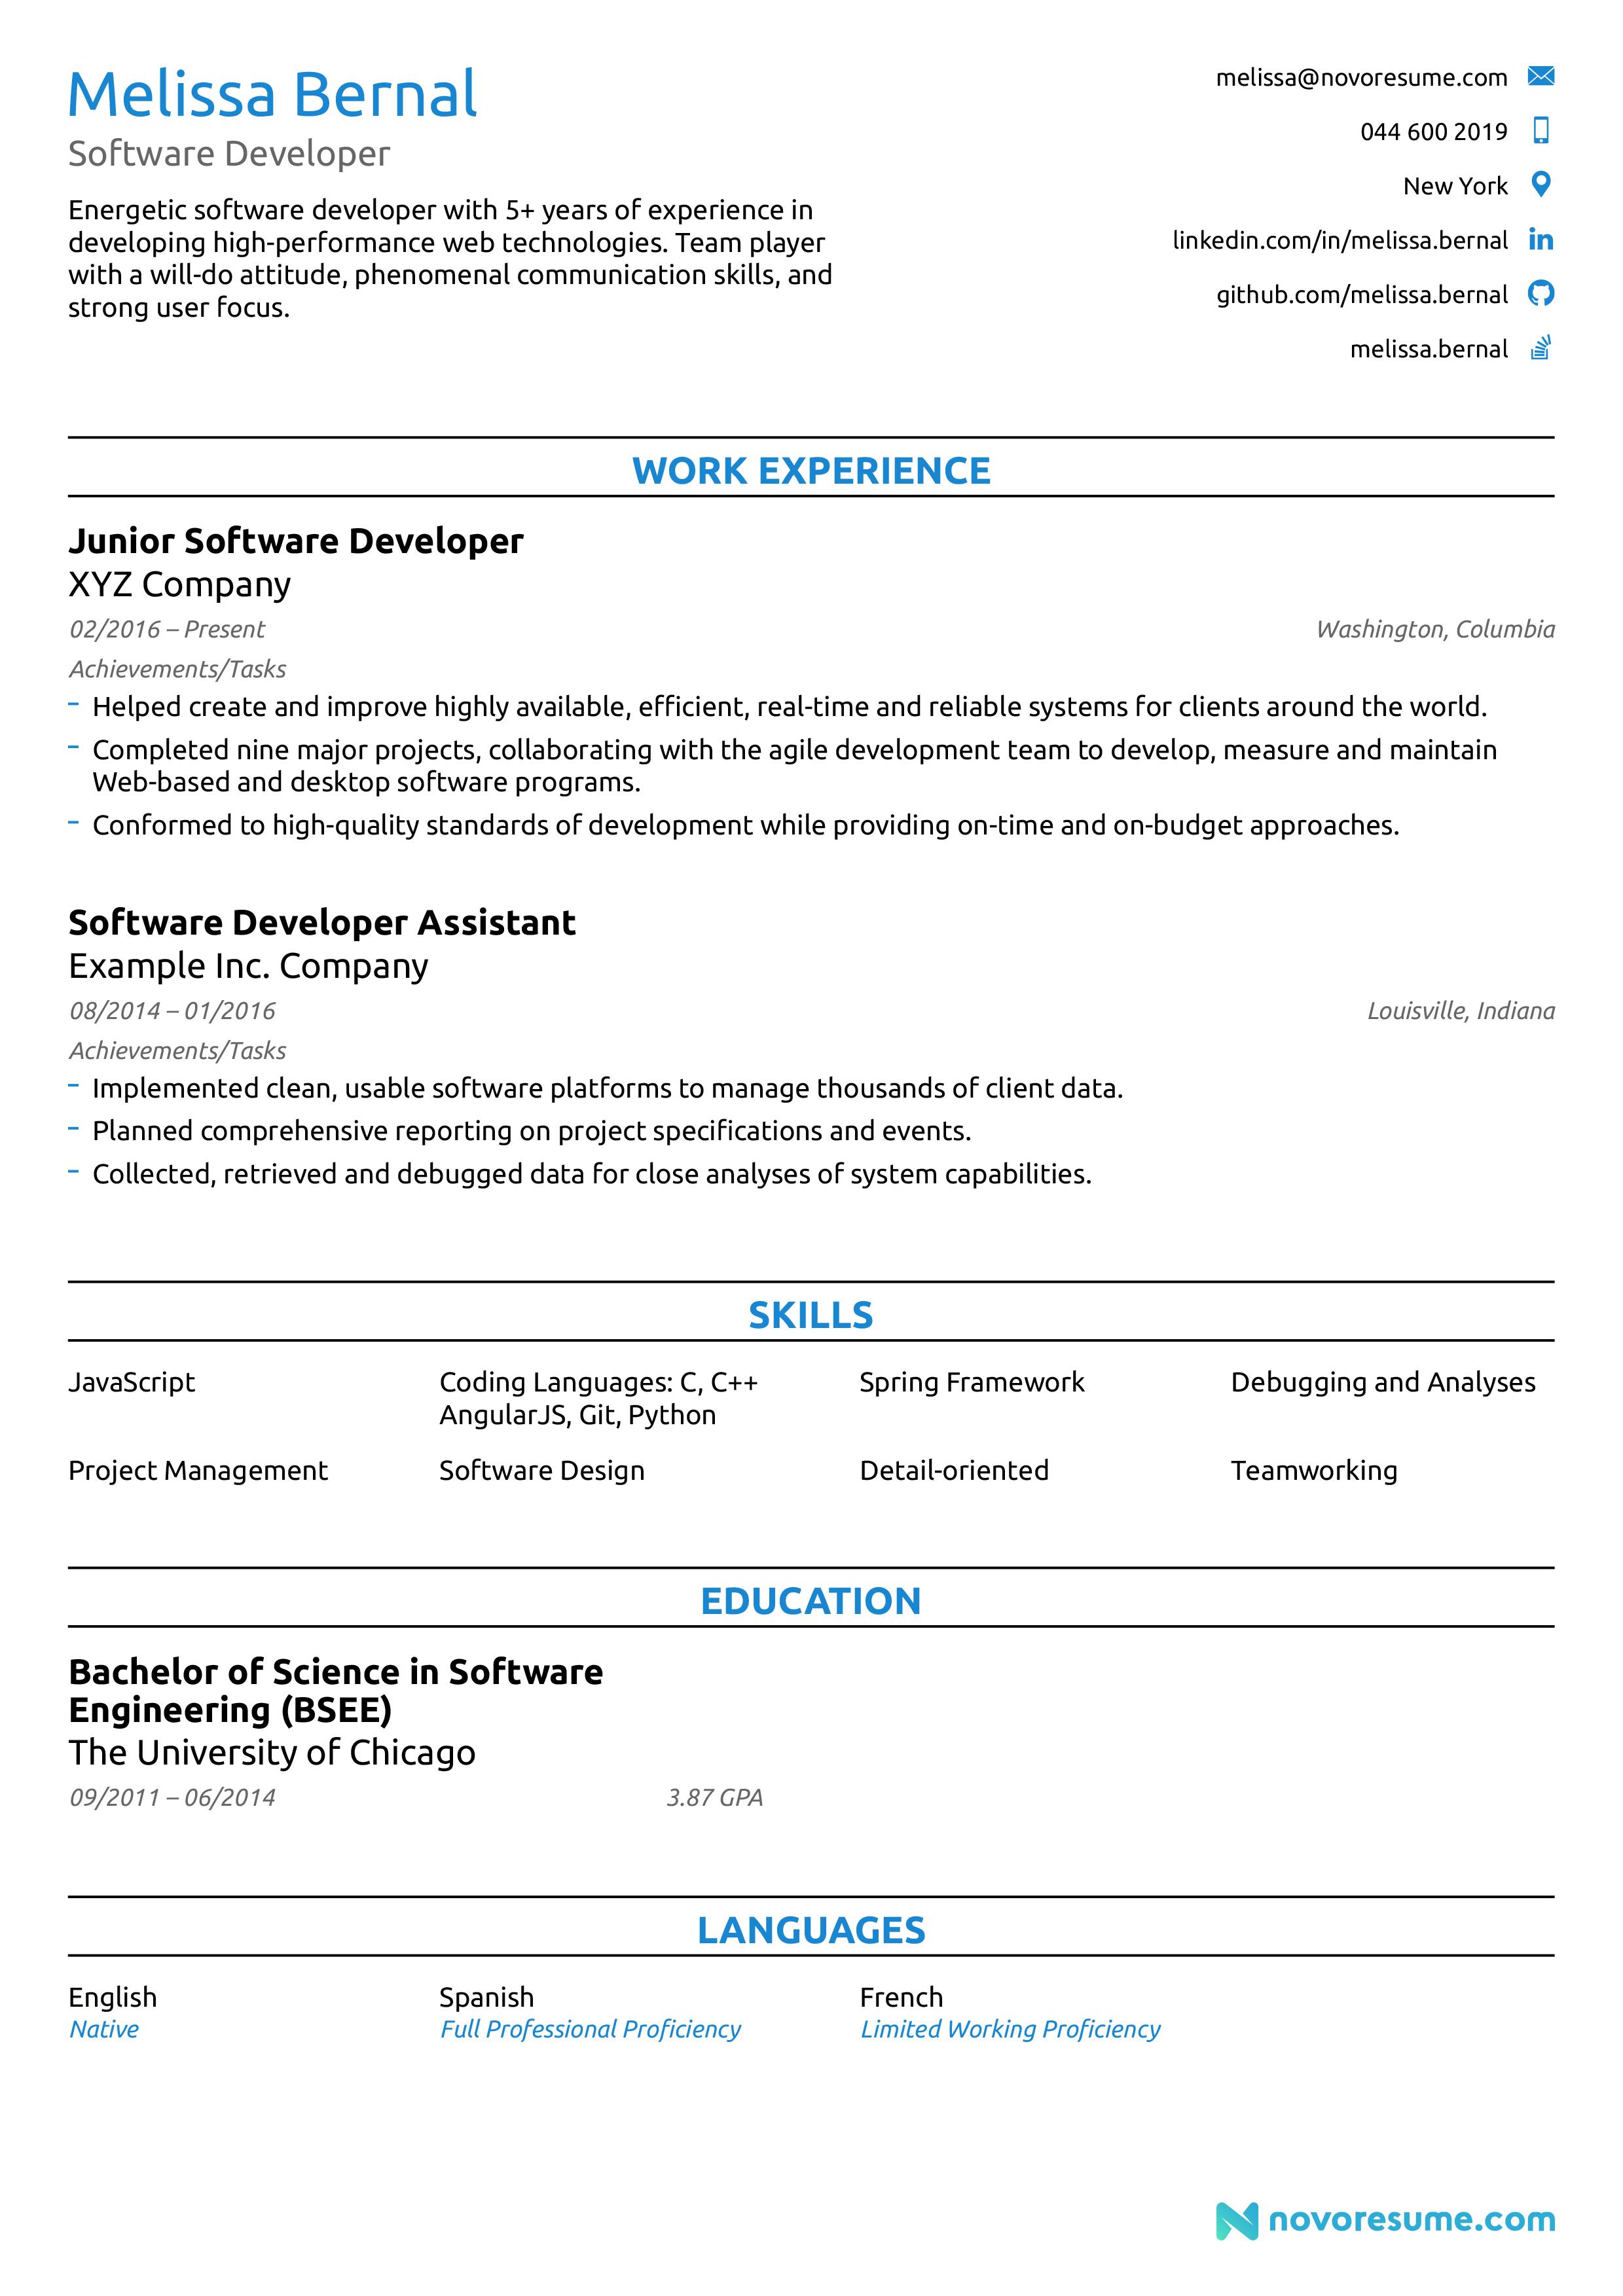 keyword ats optimized resume